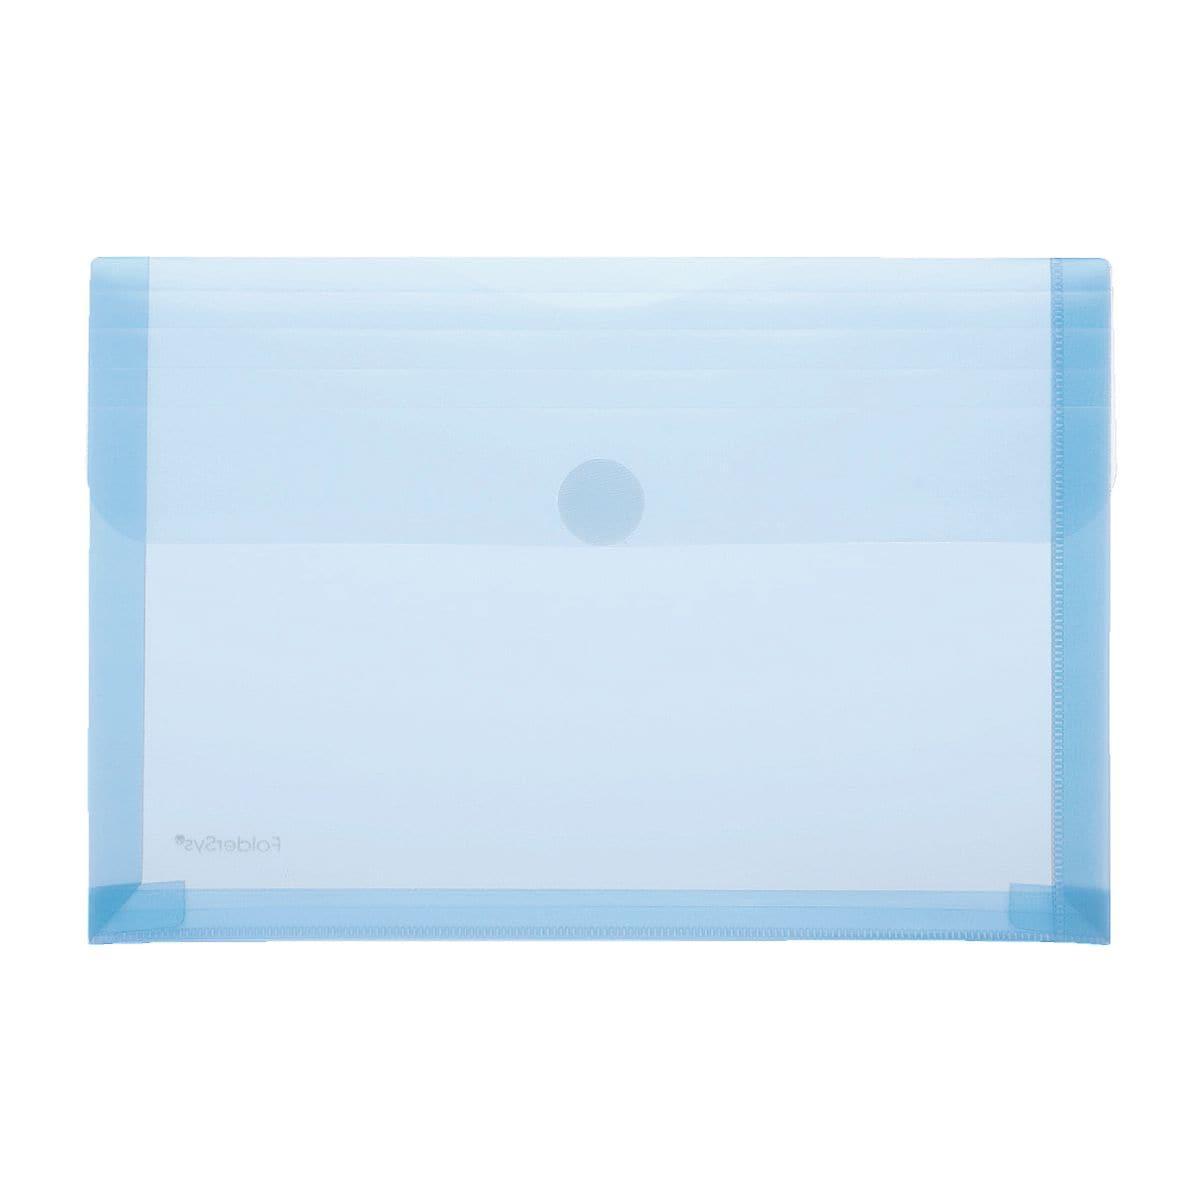 Foldersys Umlaufhüllen